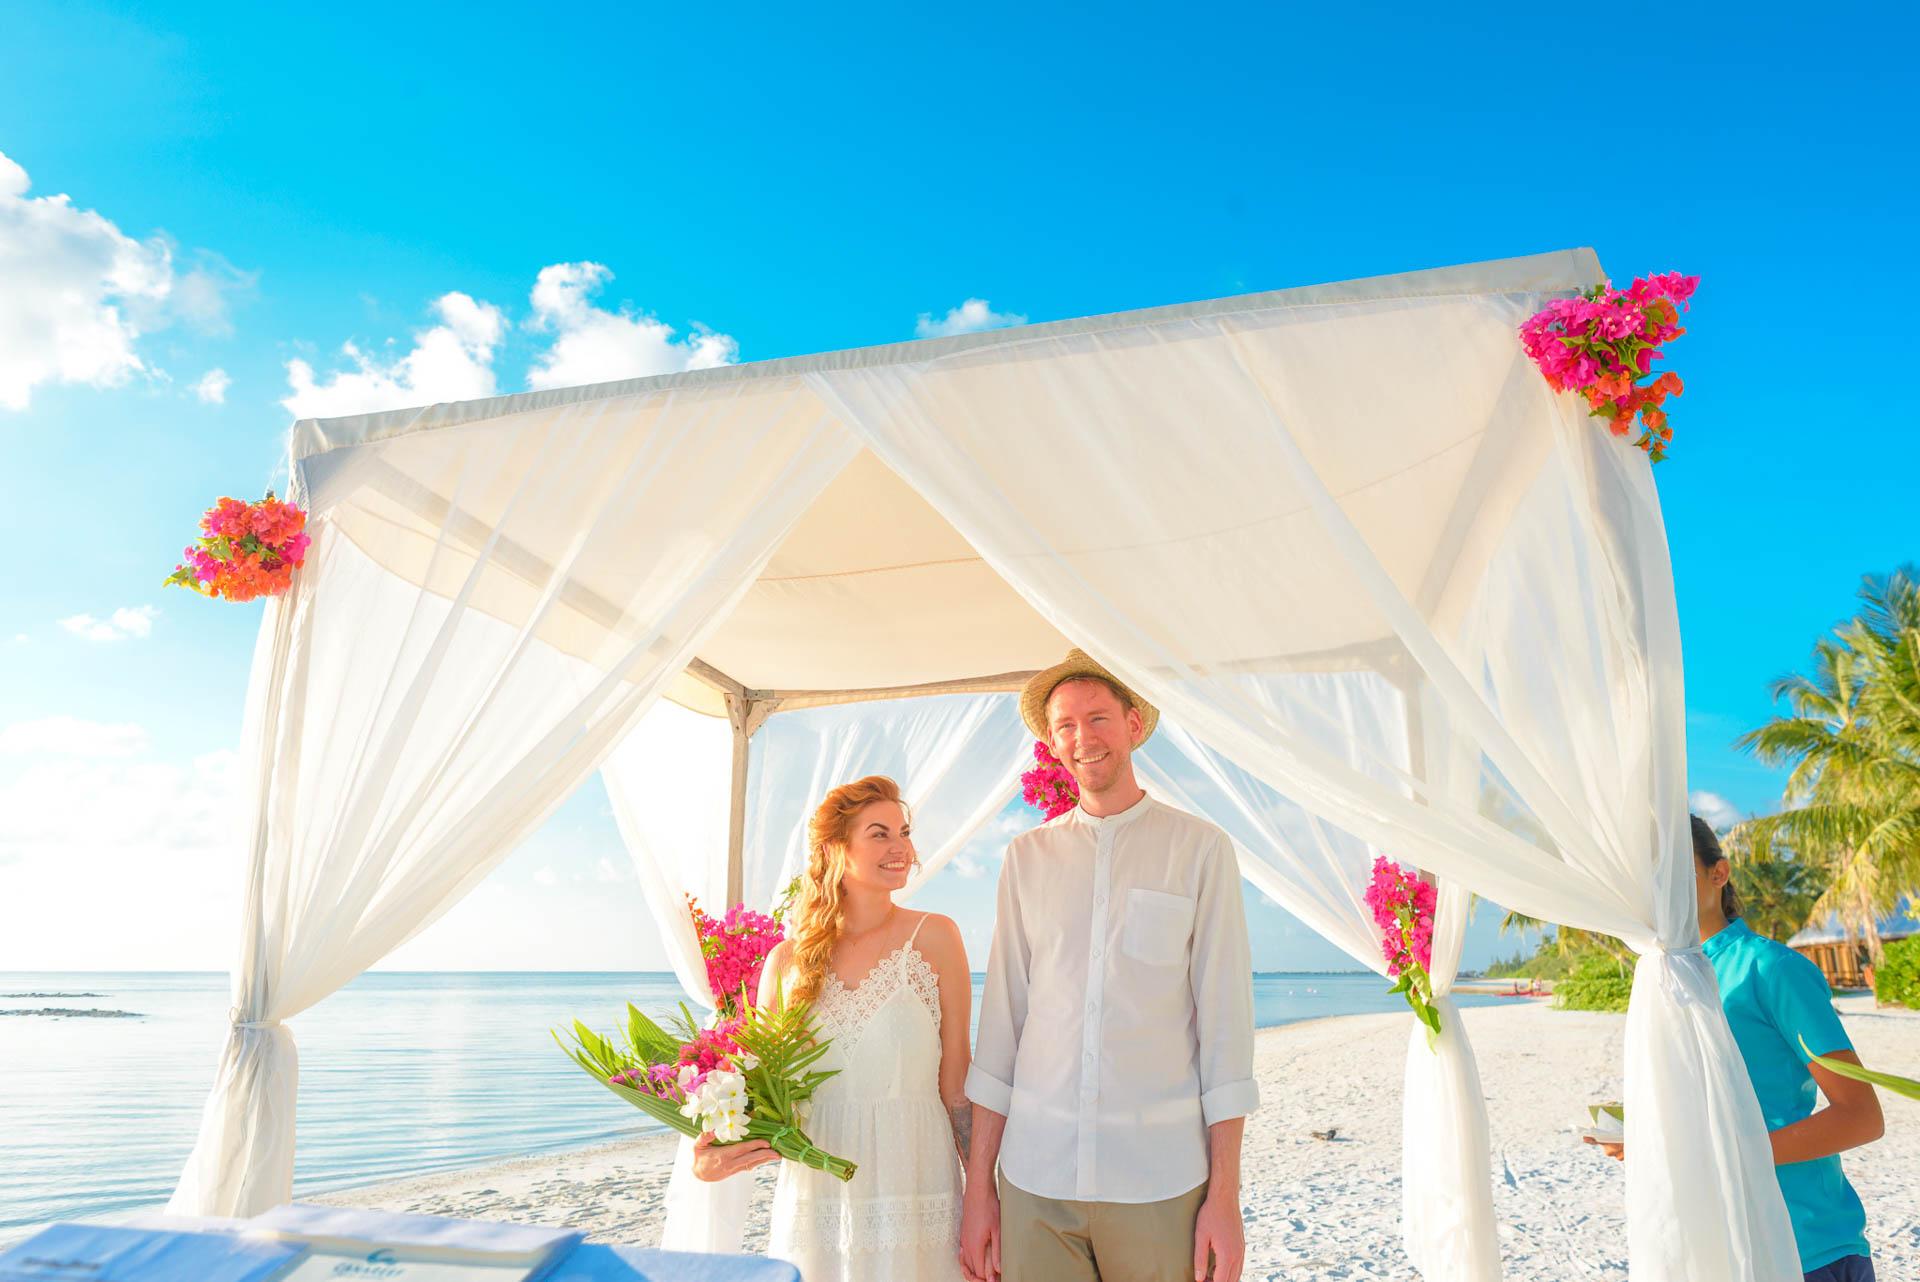 Heike Michaels Beach Wedding in Maldives 22